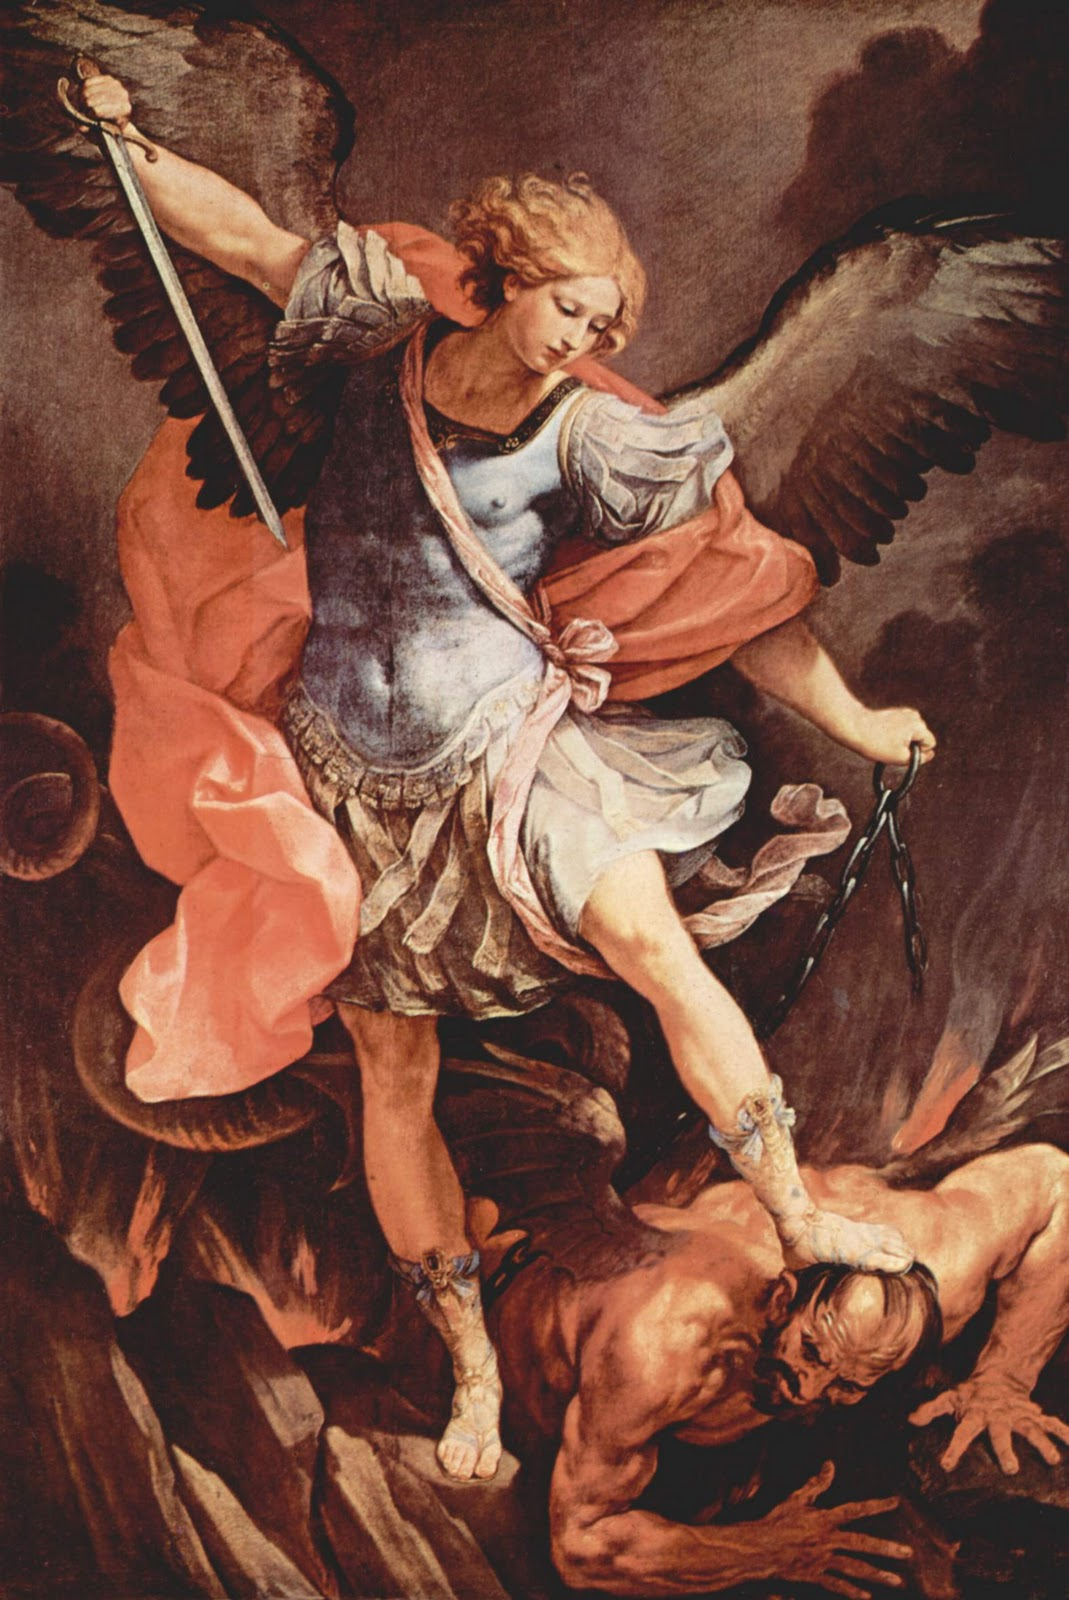 Guido Reni 1575-1642   Italian Baroque Era painter